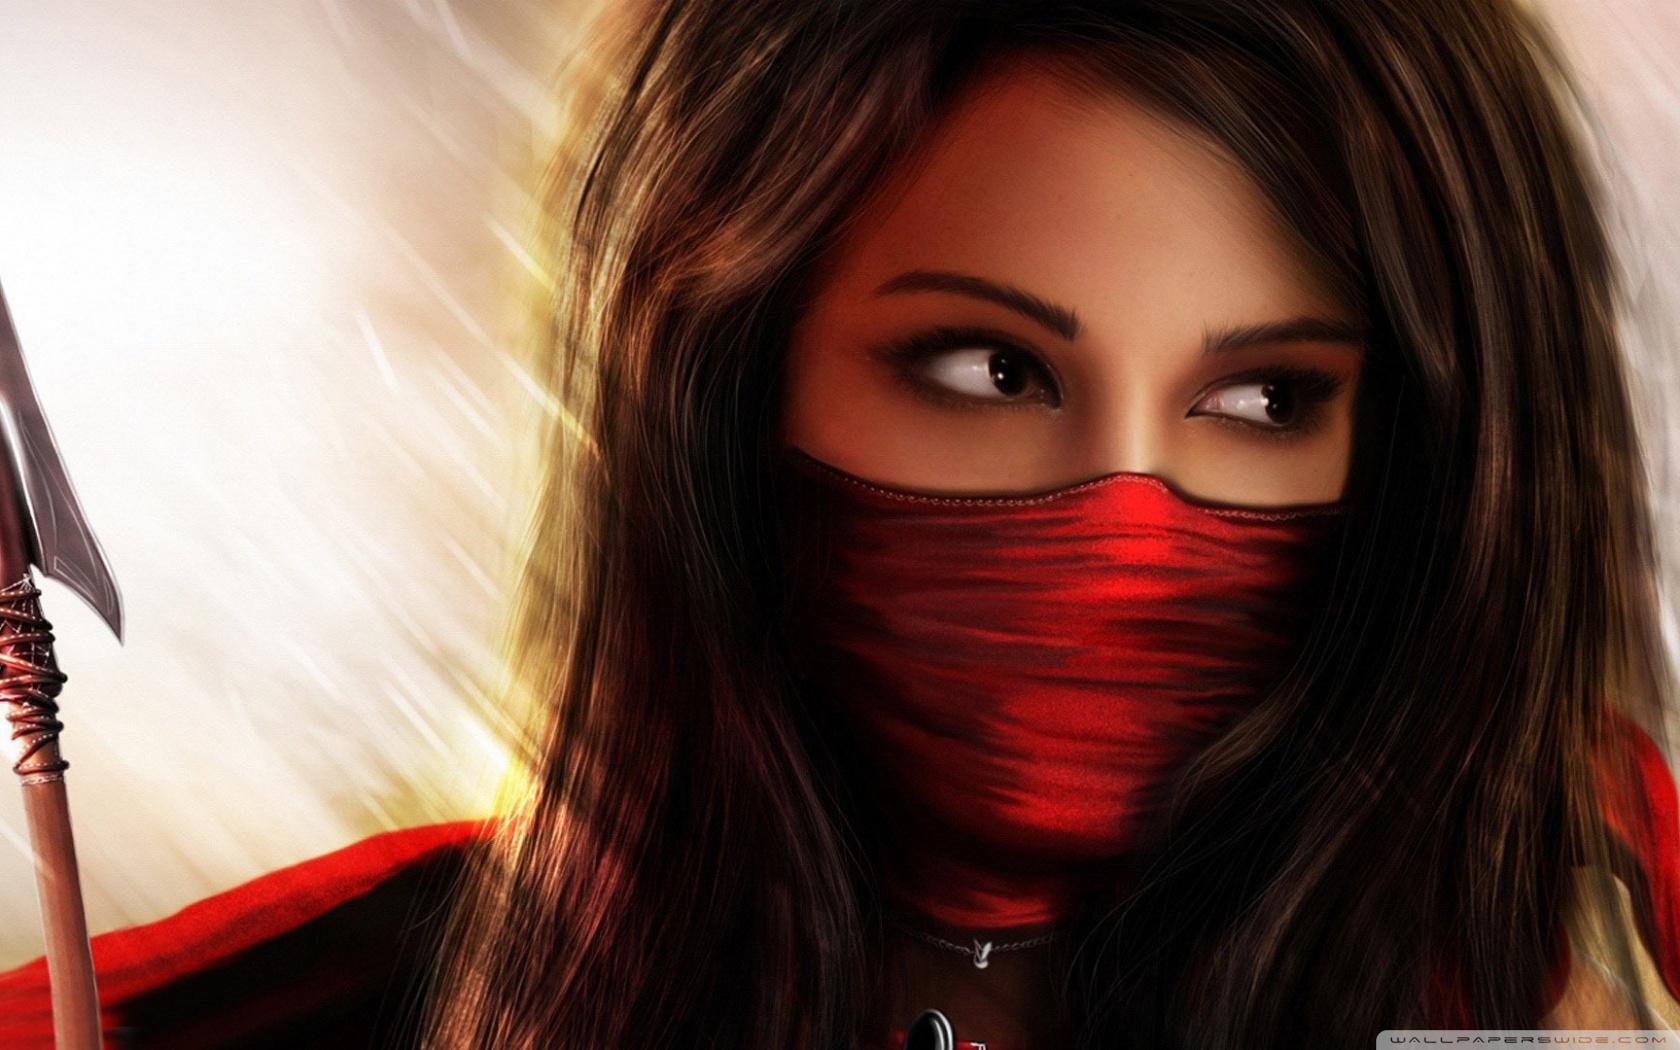 Ninja Girl Fantasy 4k Hd Desktop Wallpaper For 4k Ultra